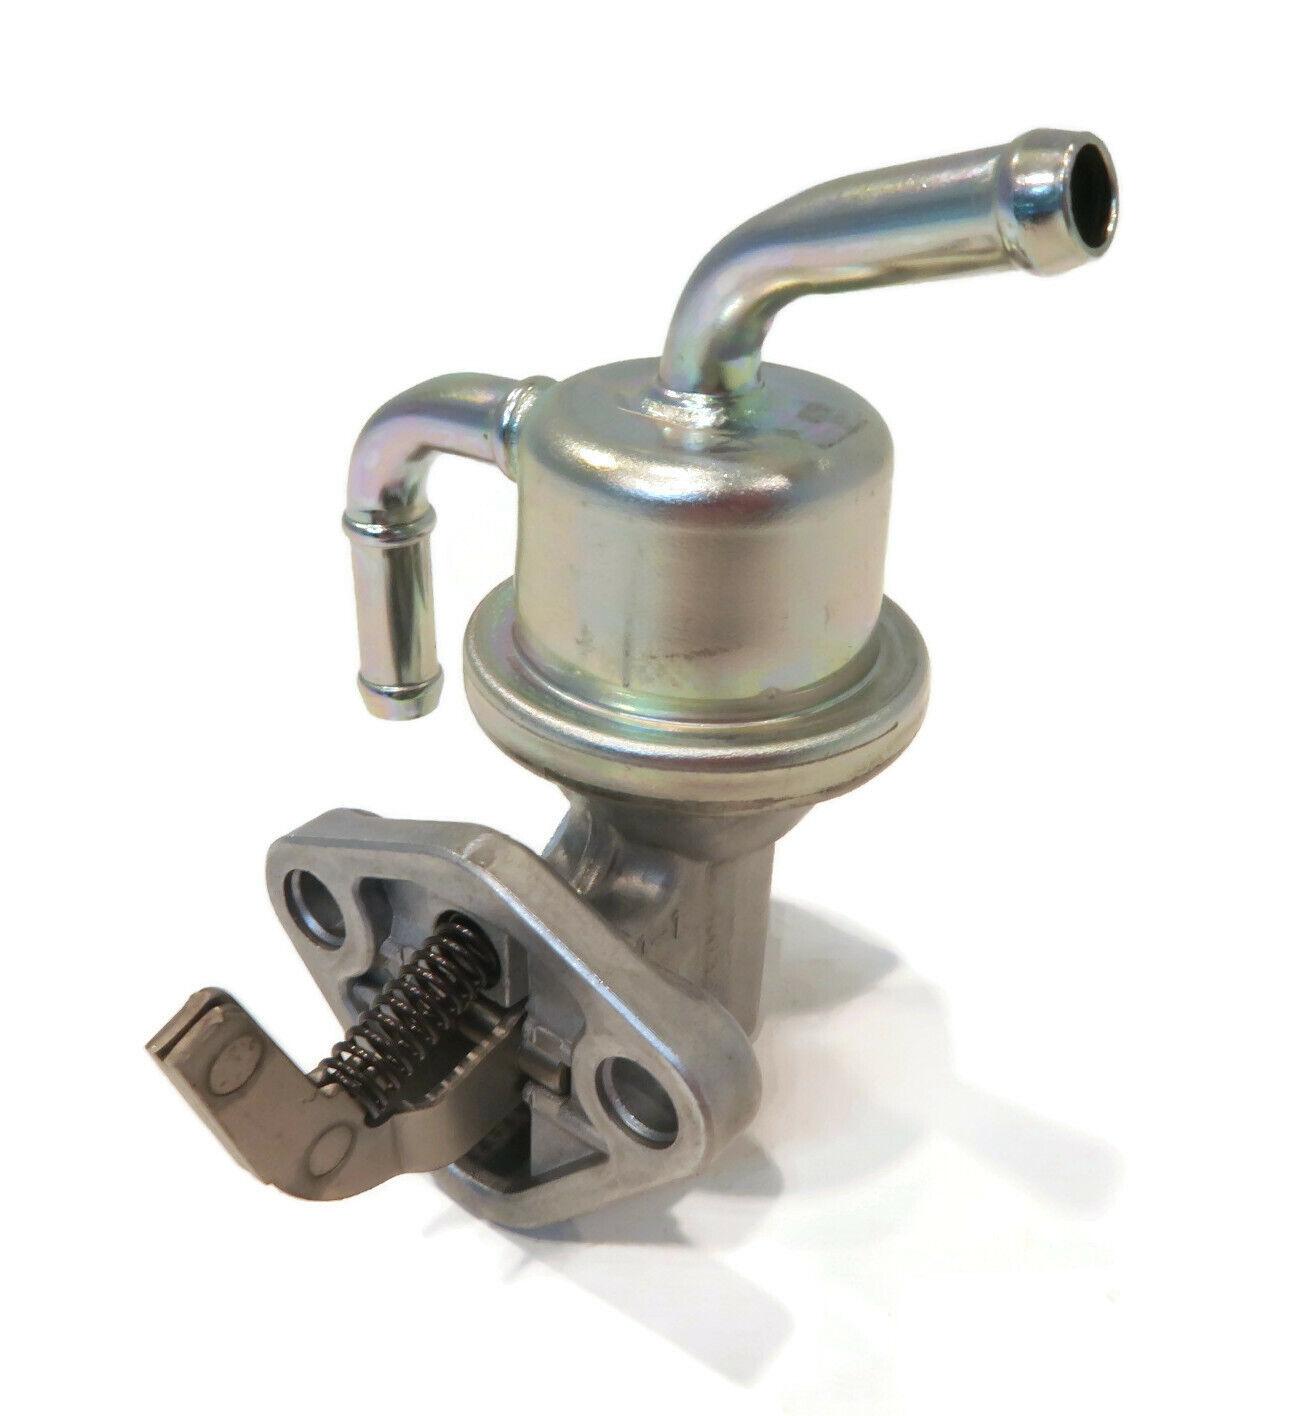 OEM Kubota Fuel Lift Pump for Grasshopper 428D, 430D, 928D